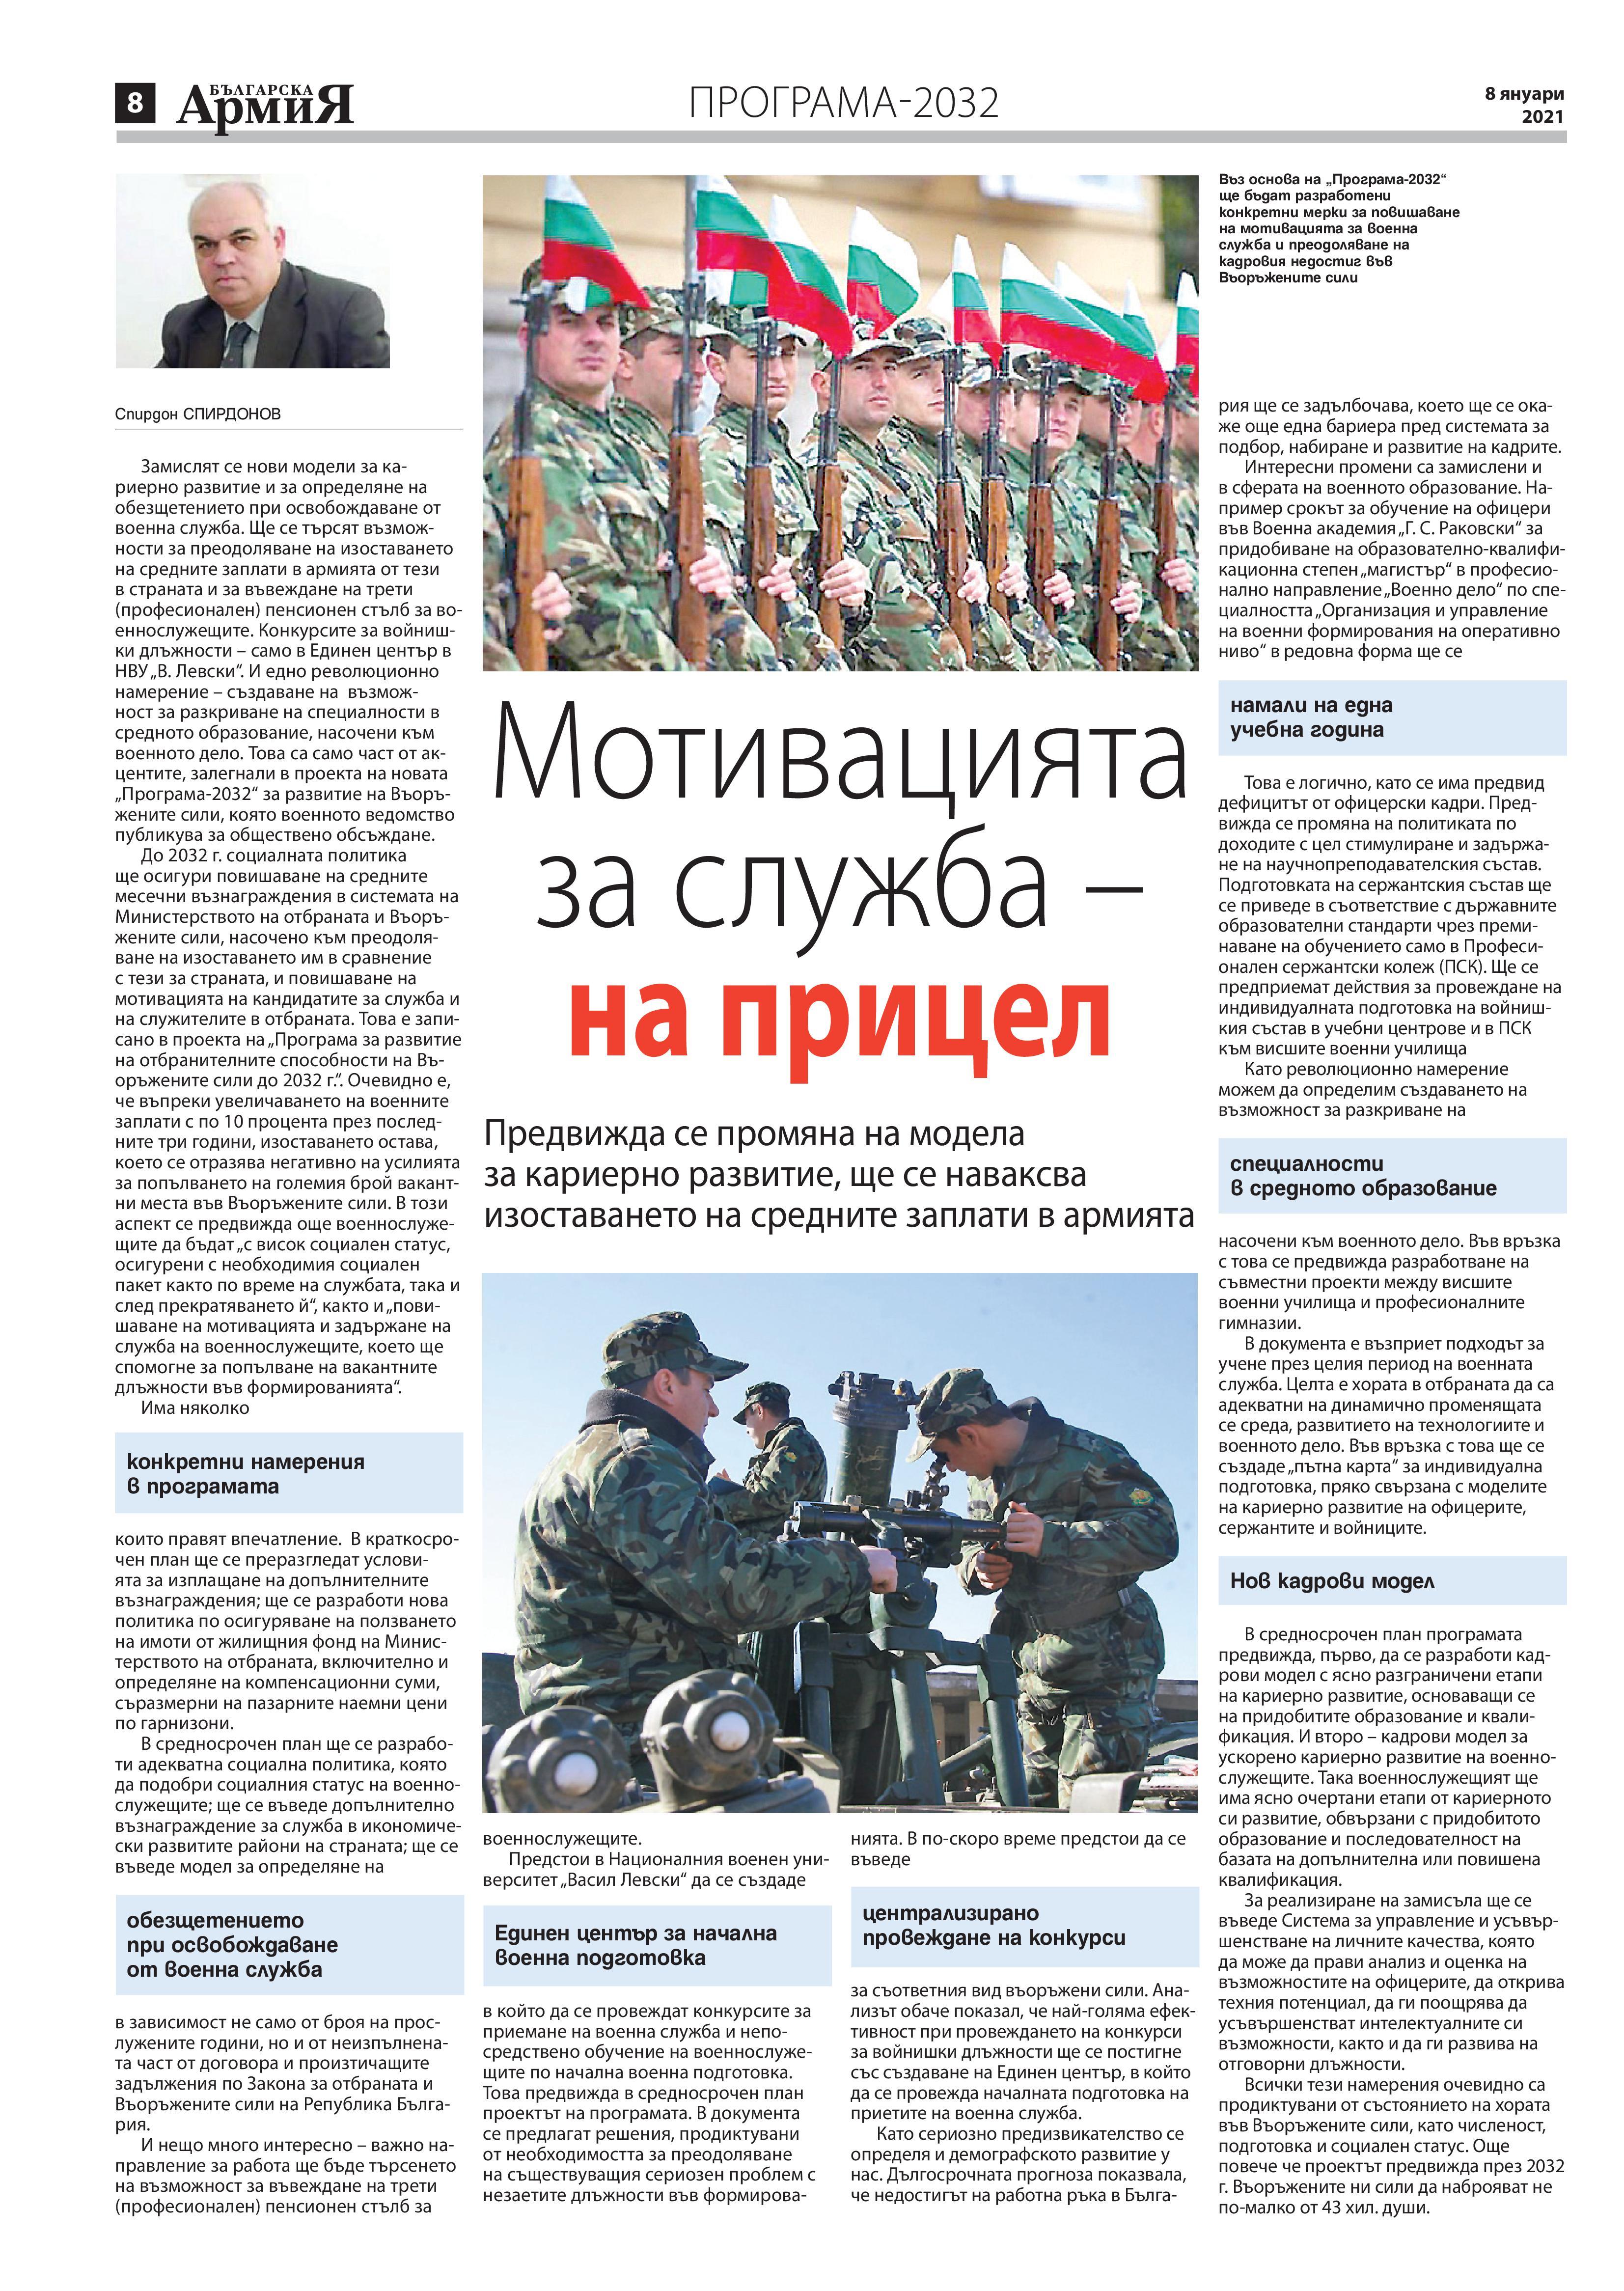 https://armymedia.bg/wp-content/uploads/2015/06/08-54.jpg